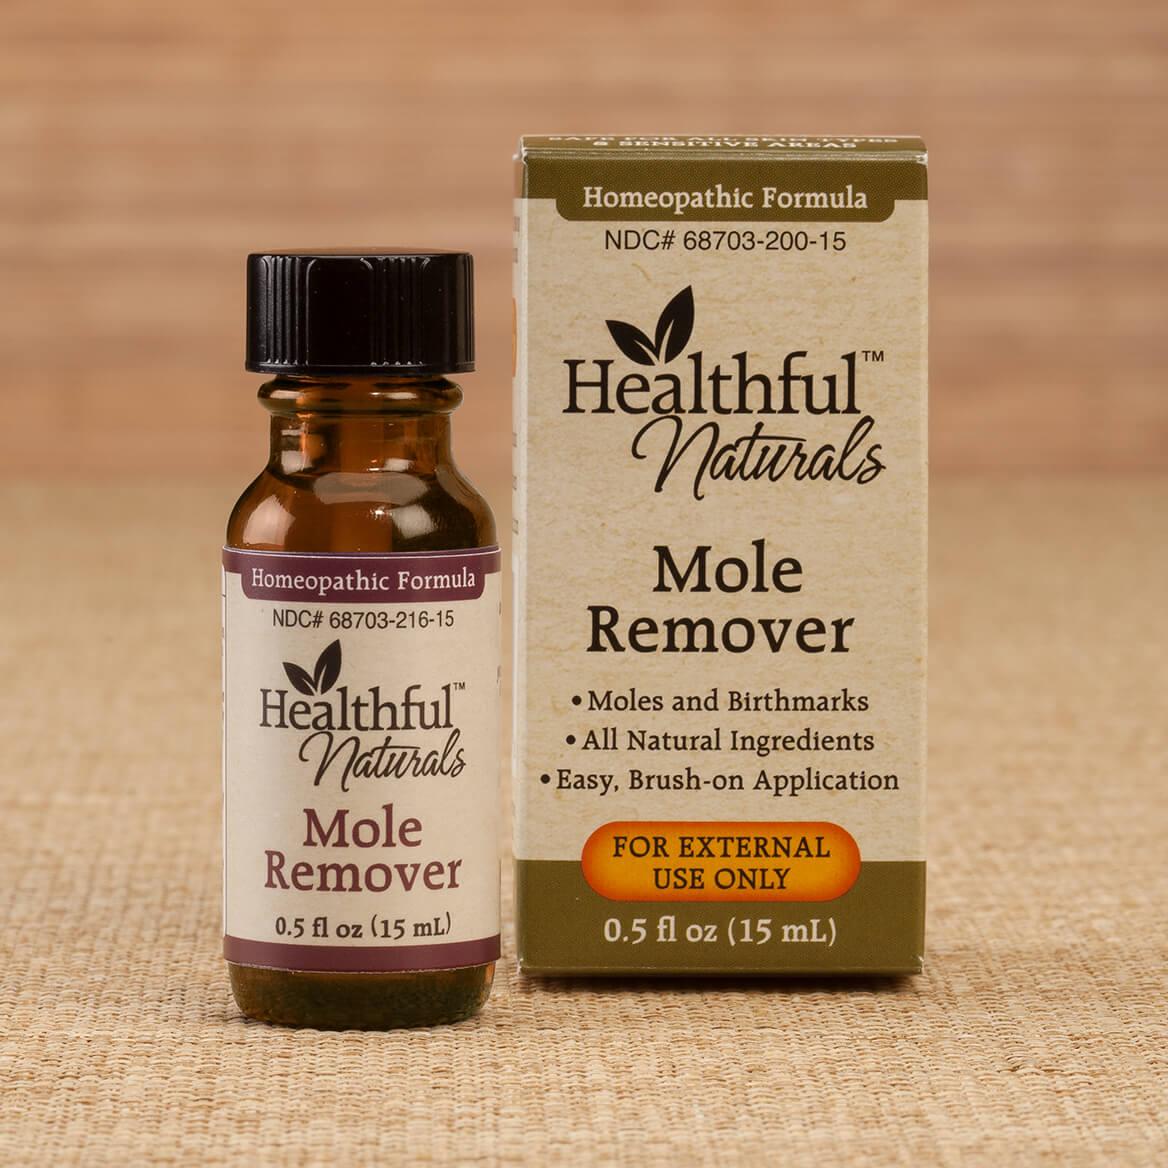 Healthful™ Naturals Mole Remover - 15 ml-354503